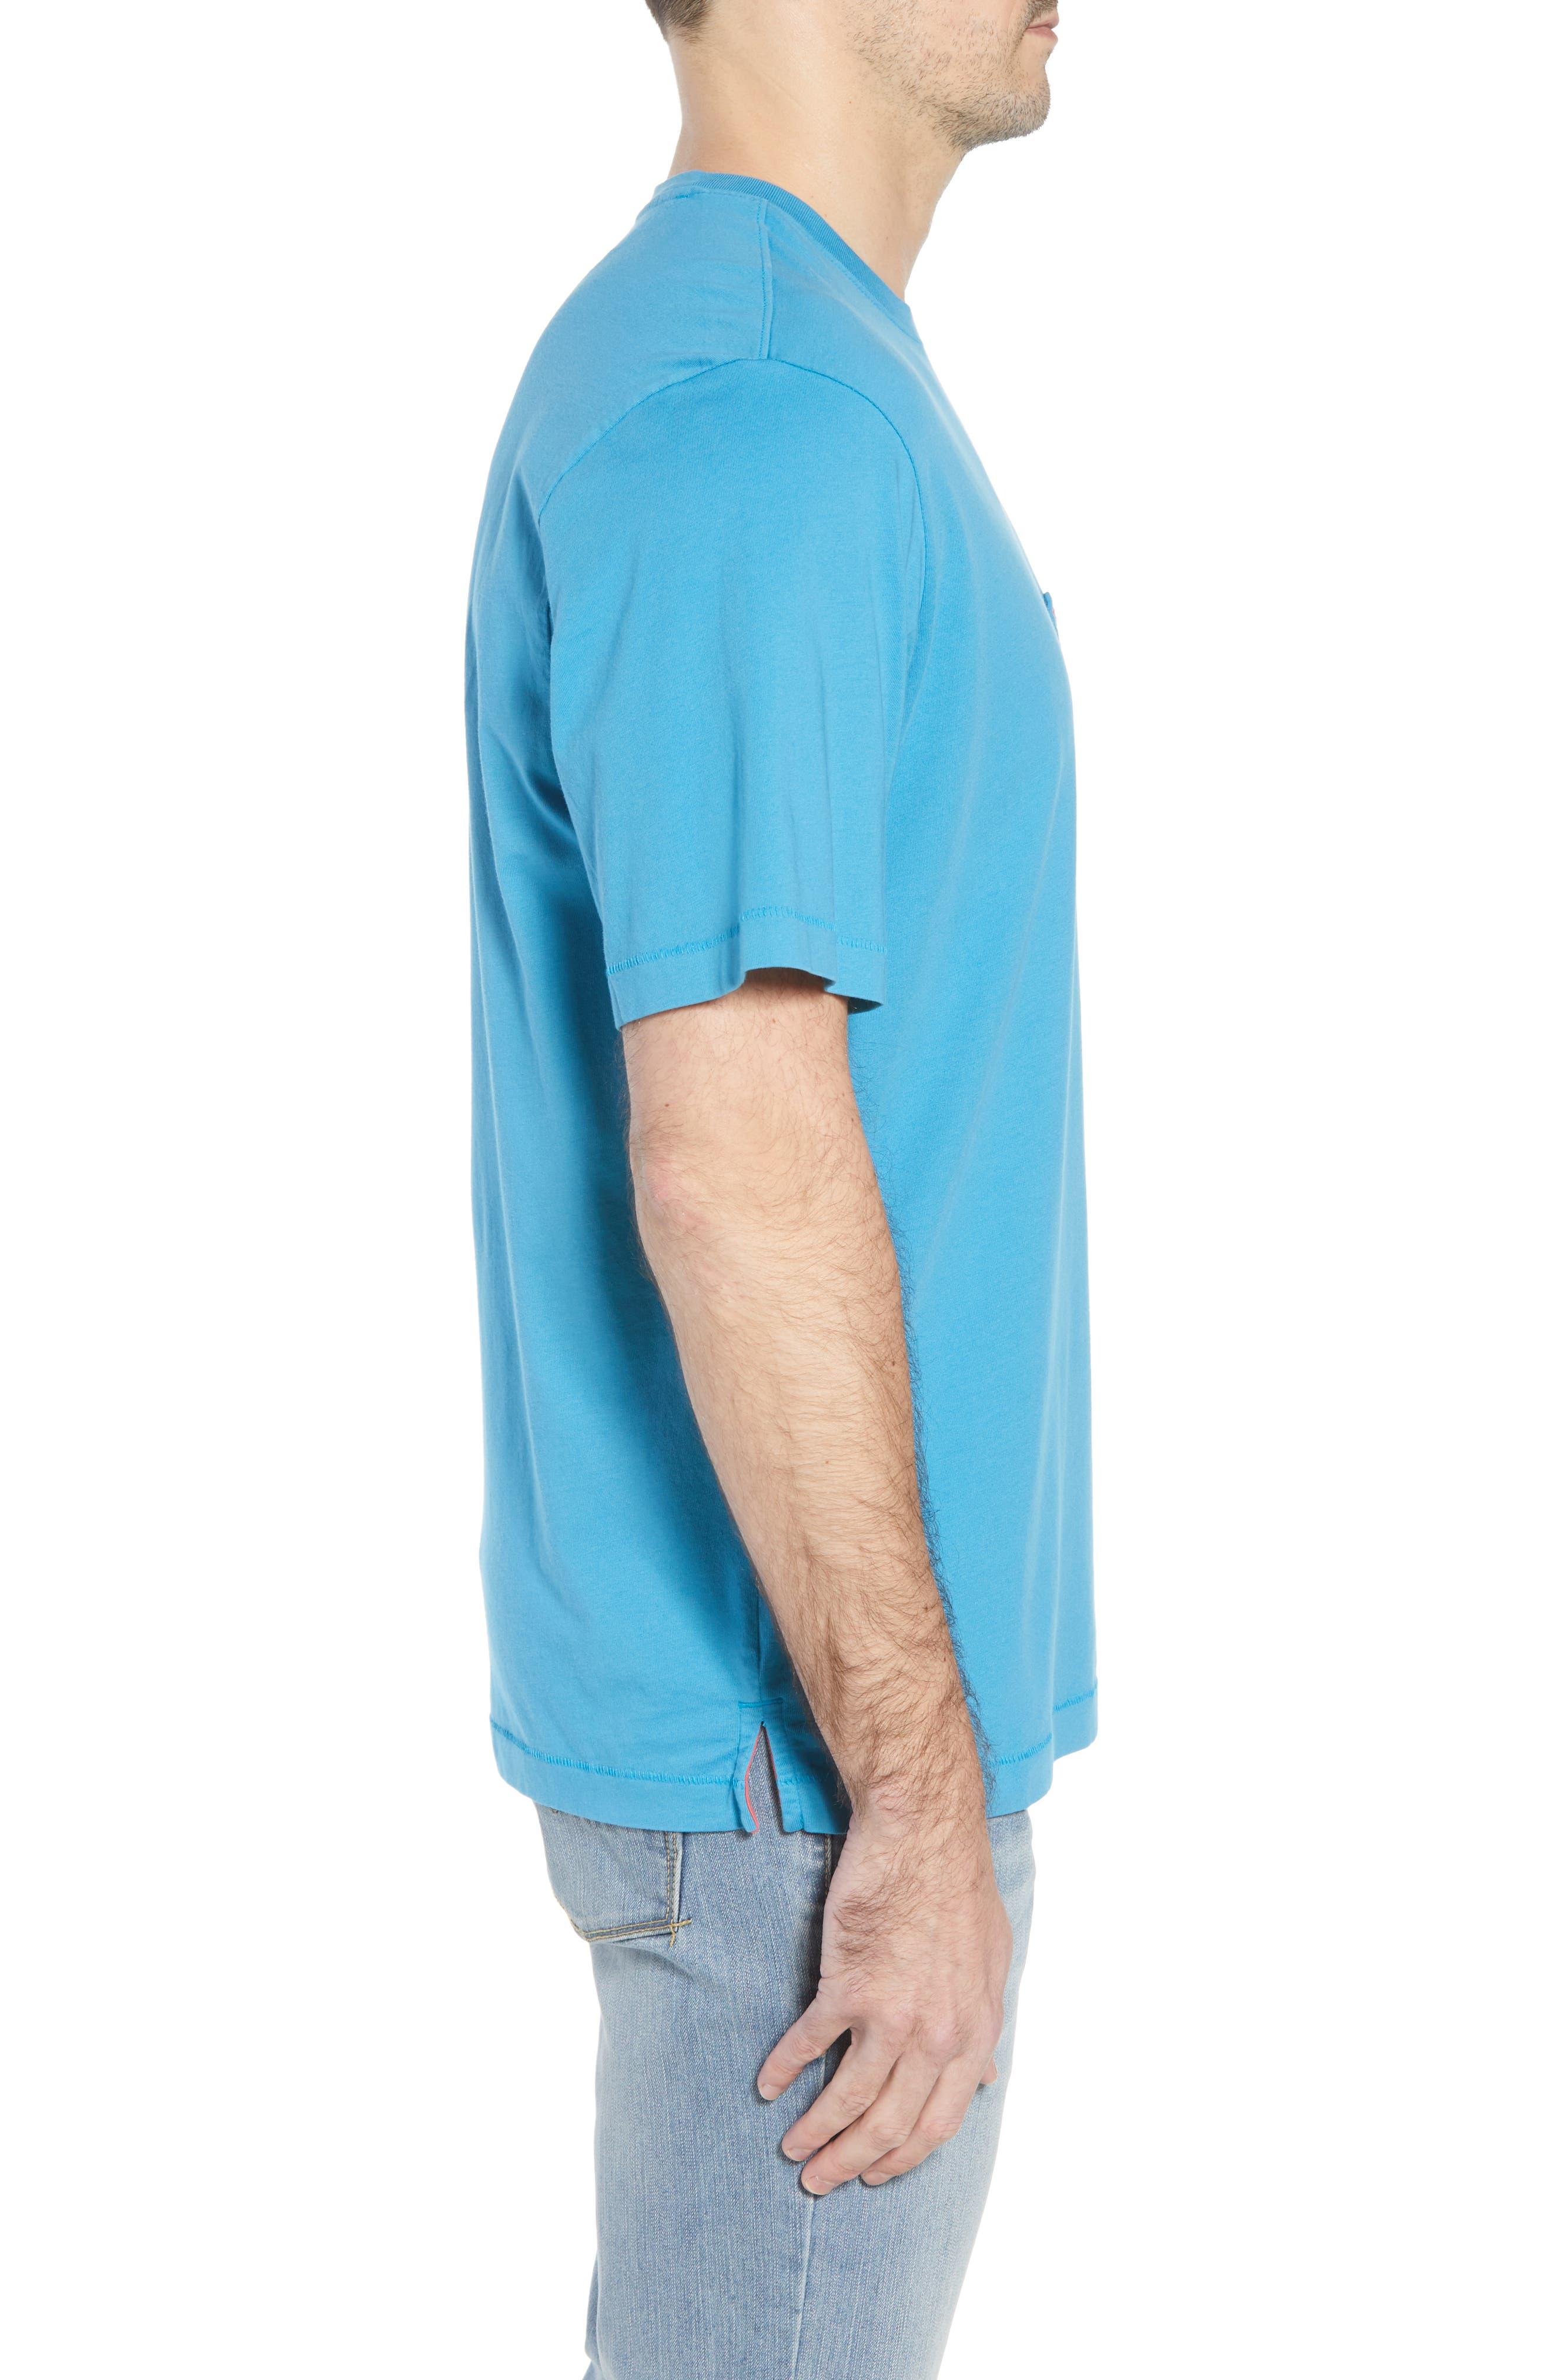 TOMMY BAHAMA,                             New Bali Sky Pima Cotton Pocket T-Shirt,                             Alternate thumbnail 3, color,                             410